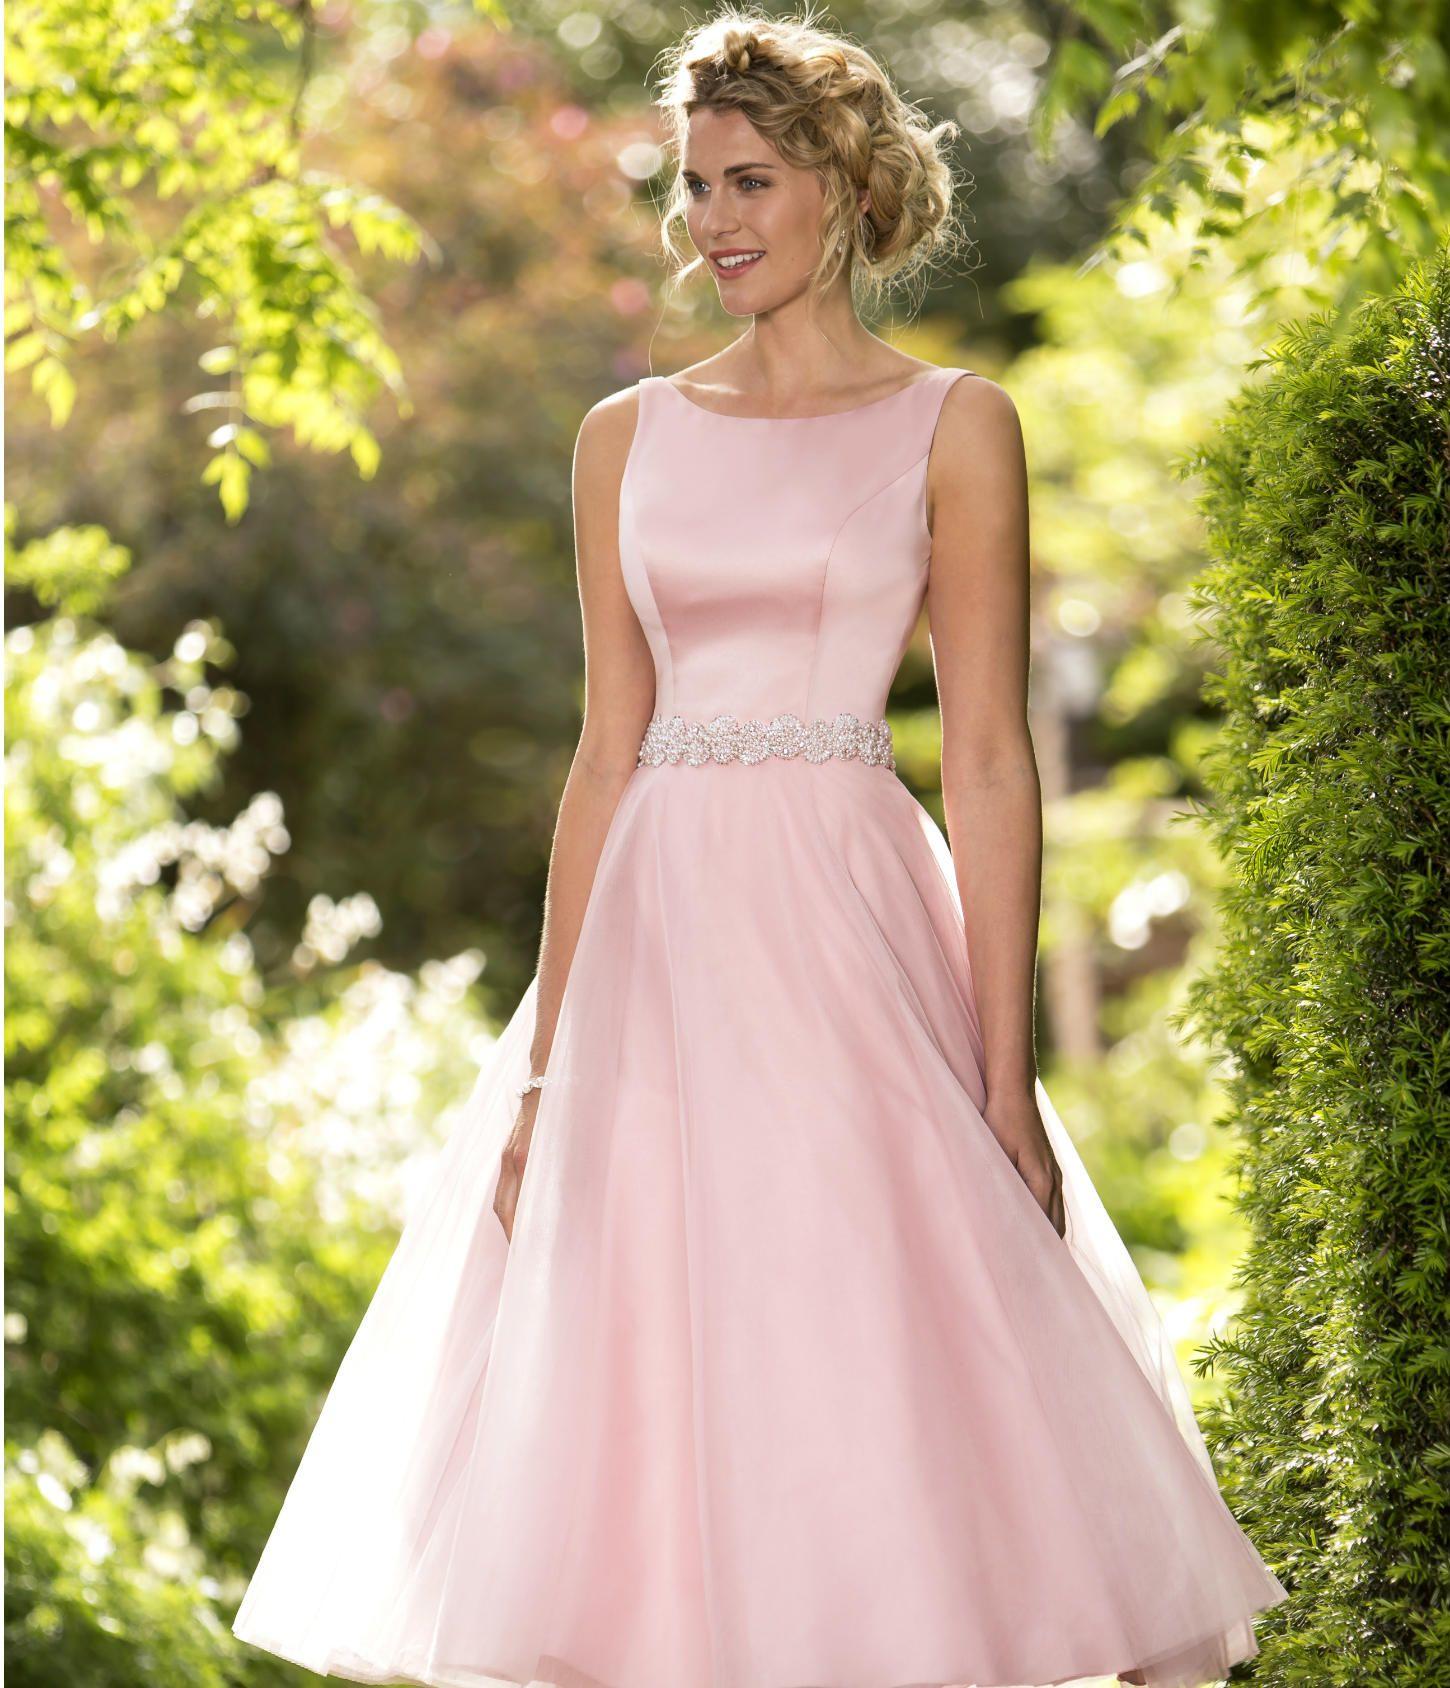 Style M647 | Tea length bridesmaid dresses, Bridesmaid ...